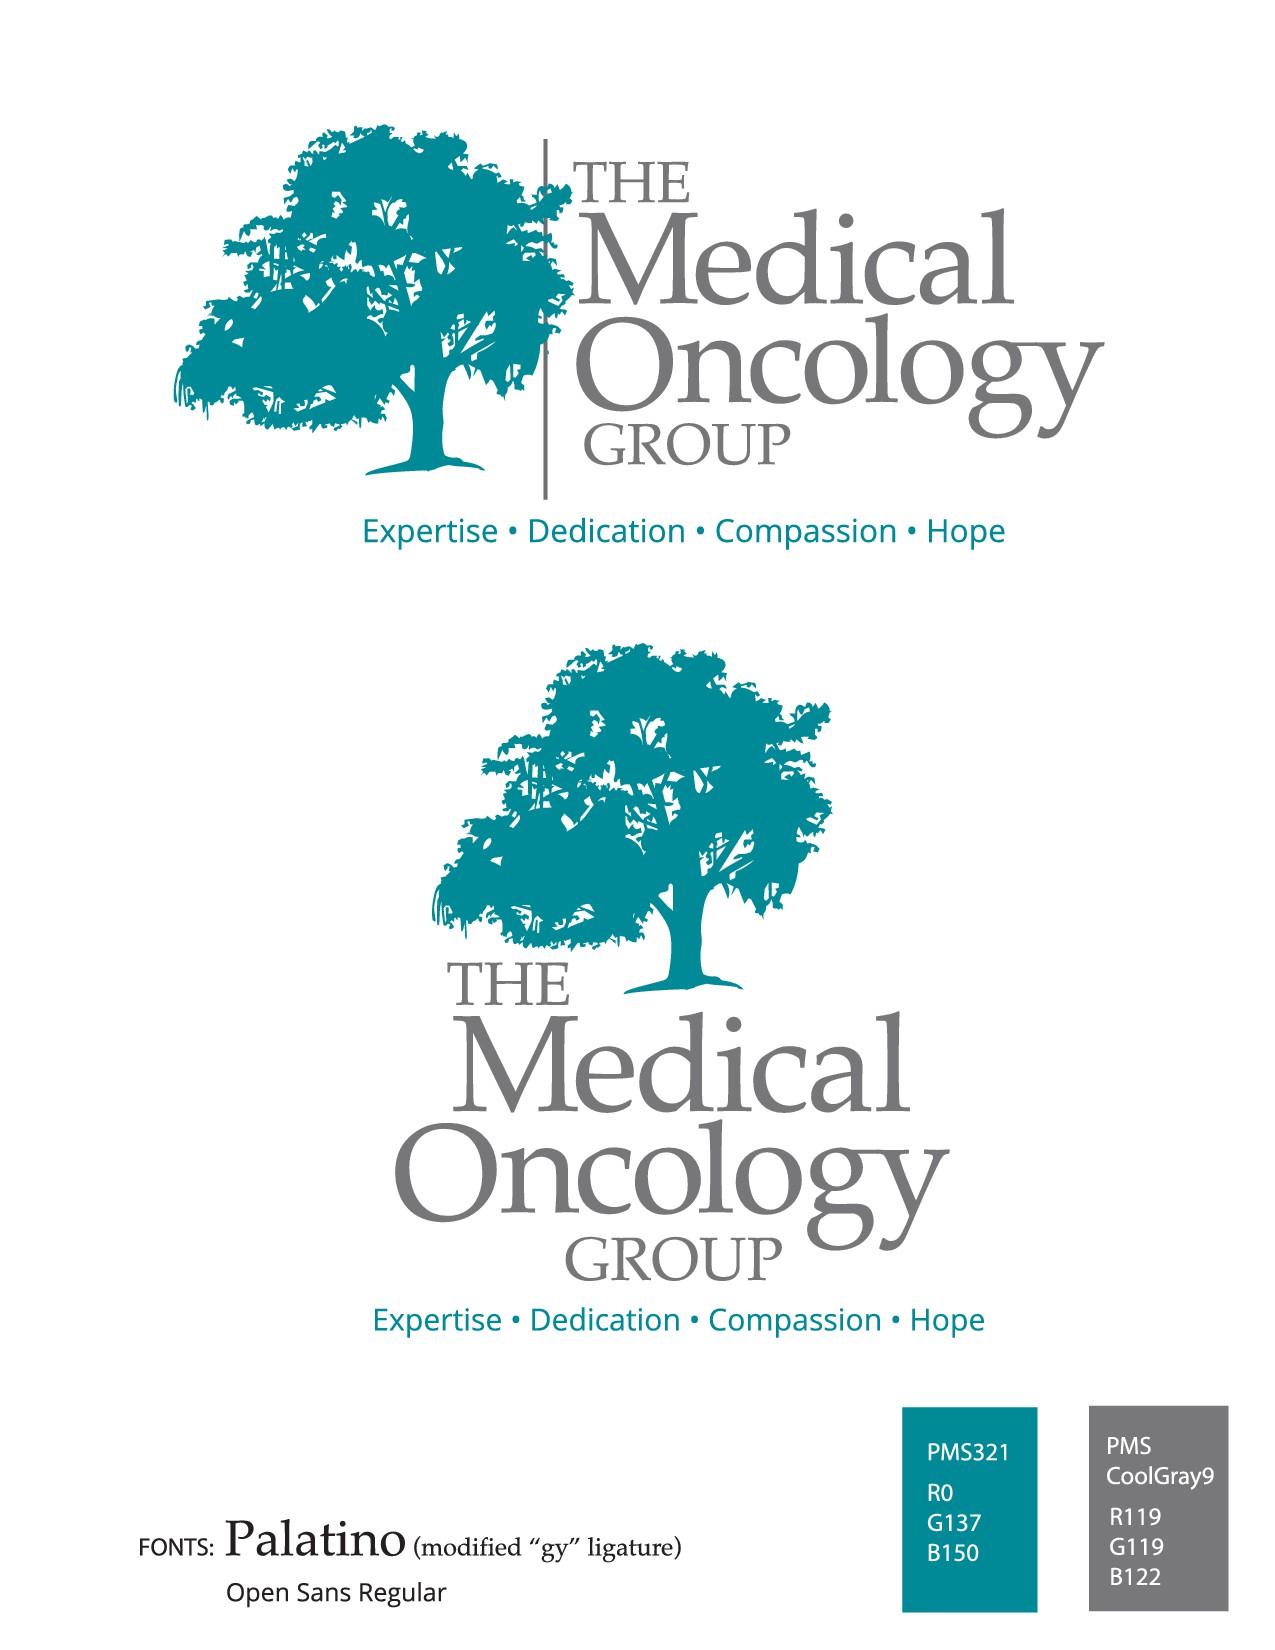 hematology oncology medical practice group logo